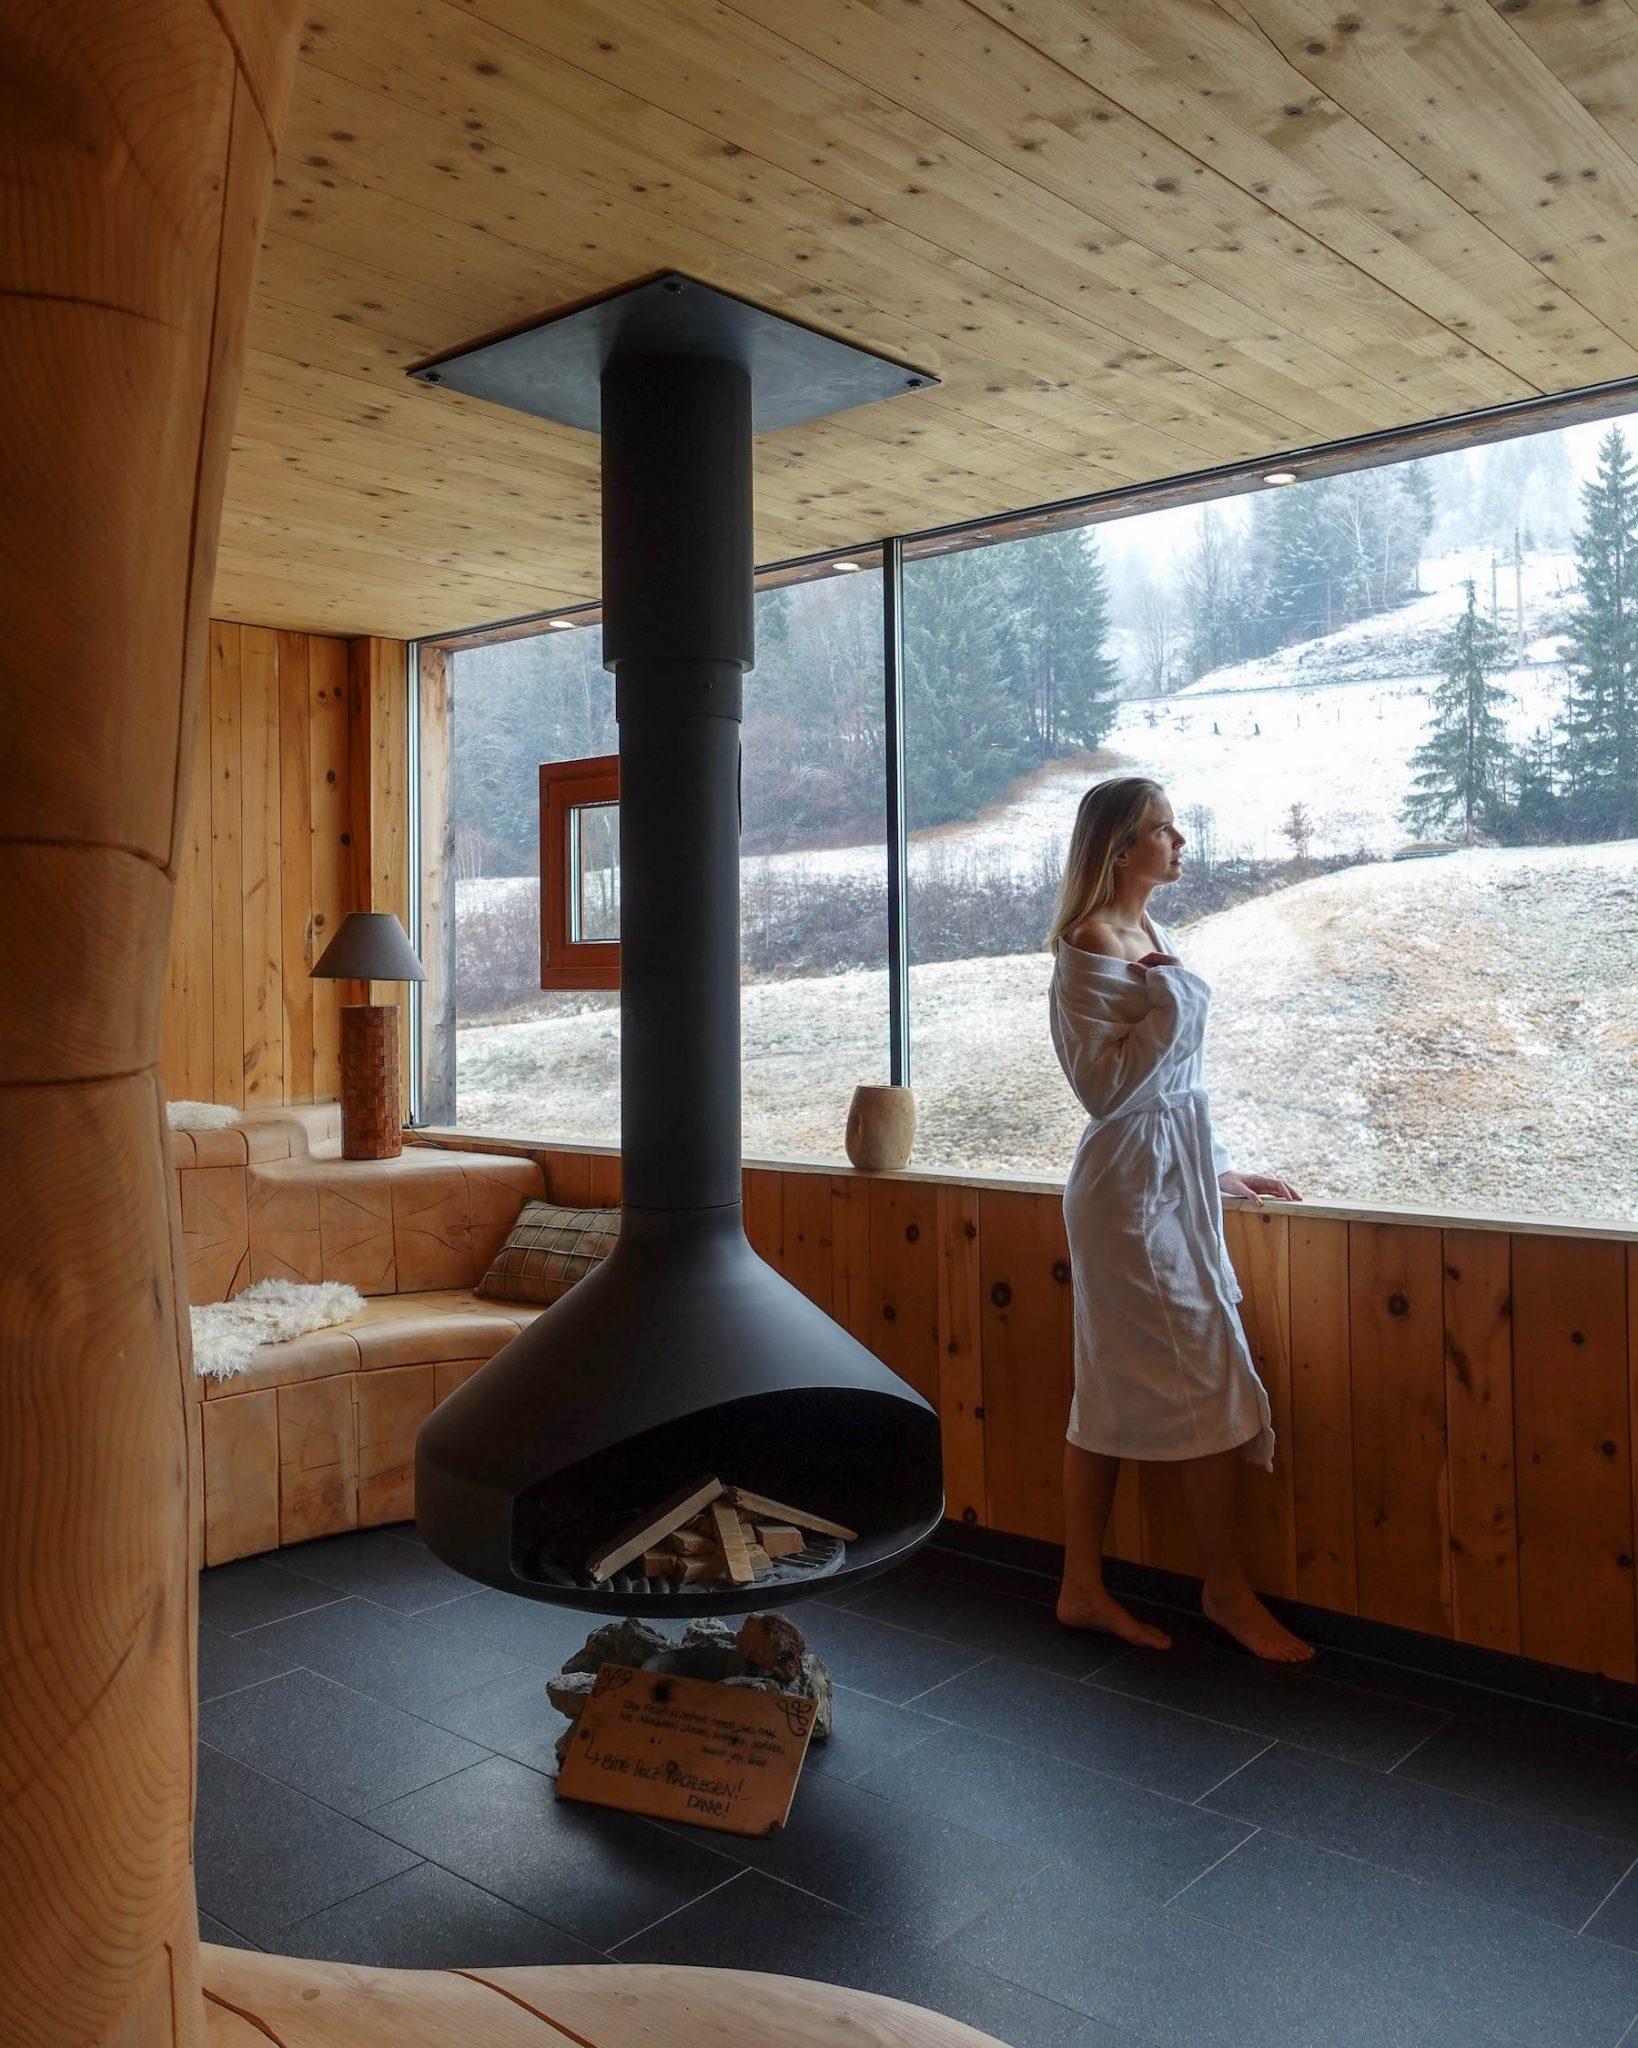 suelovesnyc_hotel_in_leogang_hotel_mama_thresl_skiurlaub_mit_freunden_wellness_susan_fengler